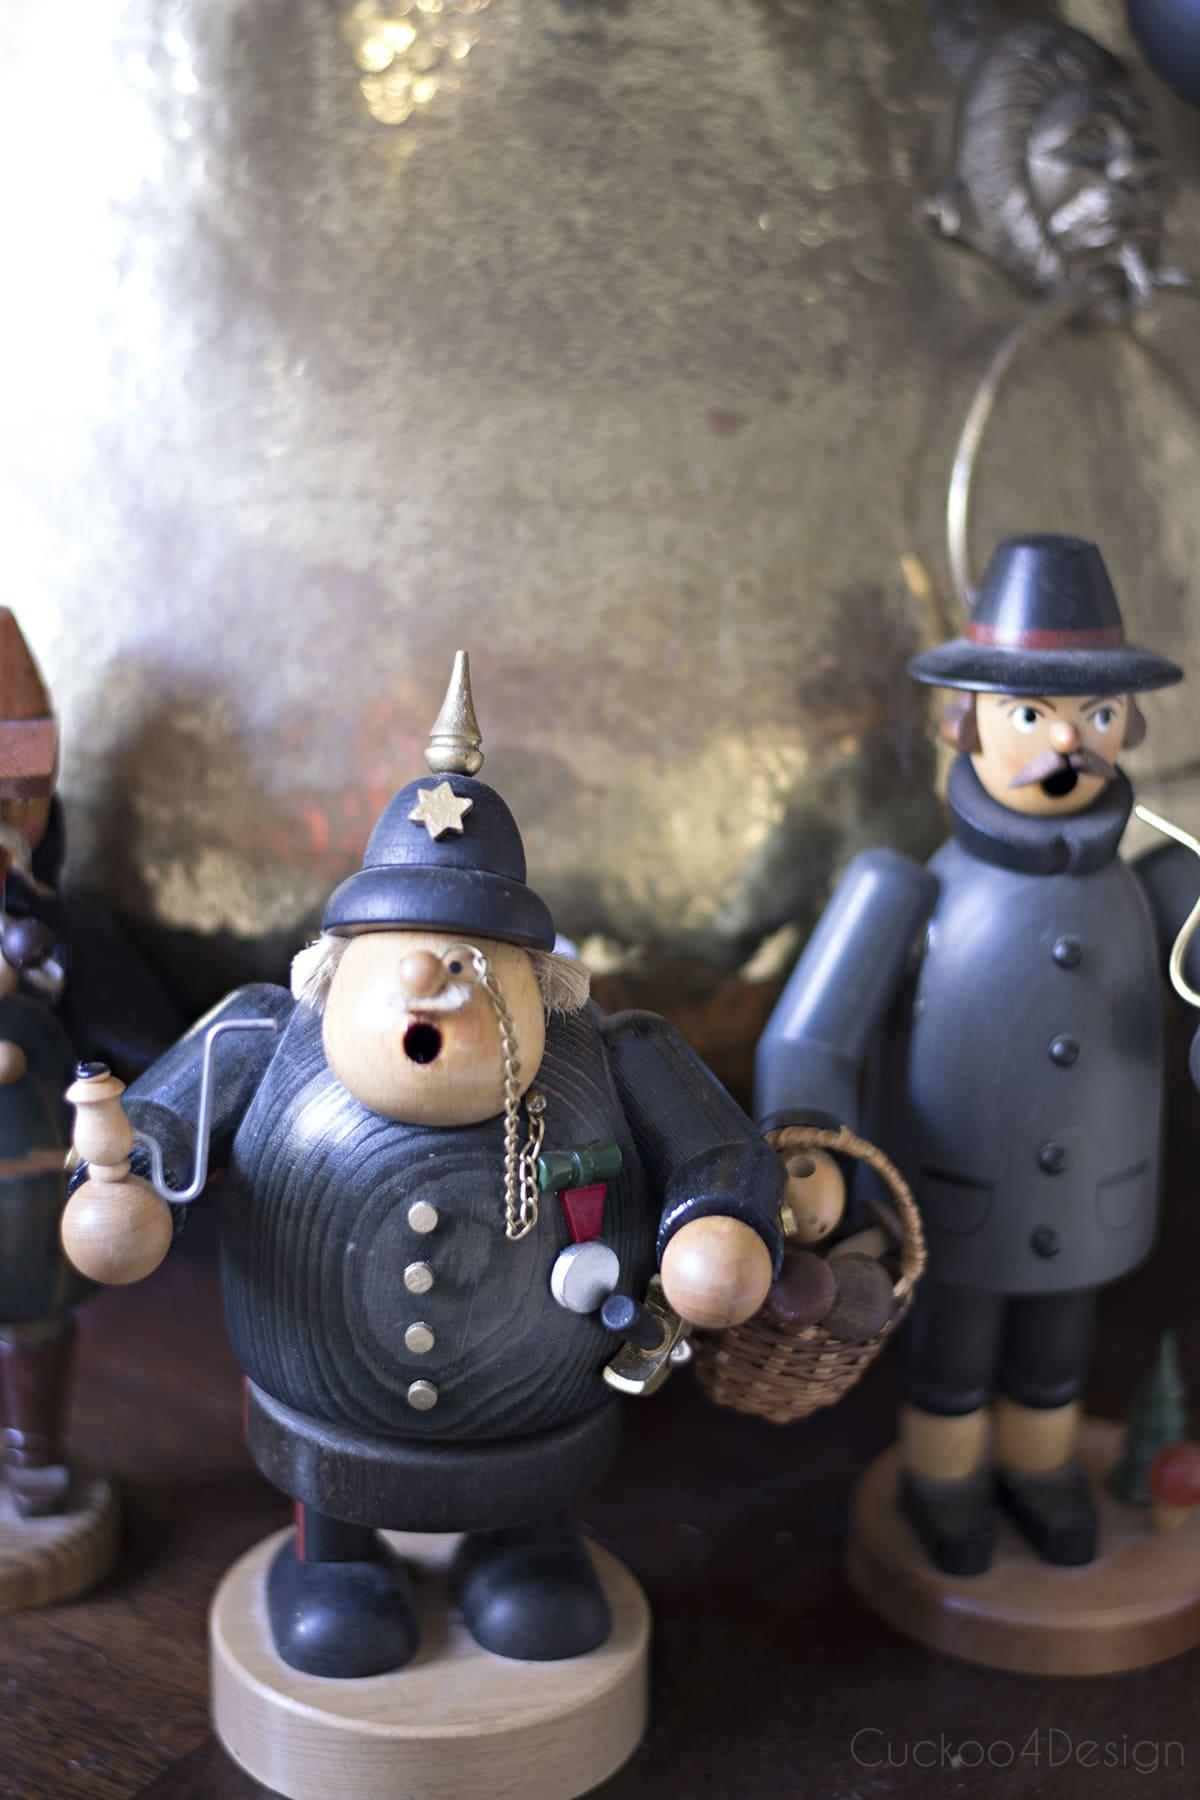 German incense smokers